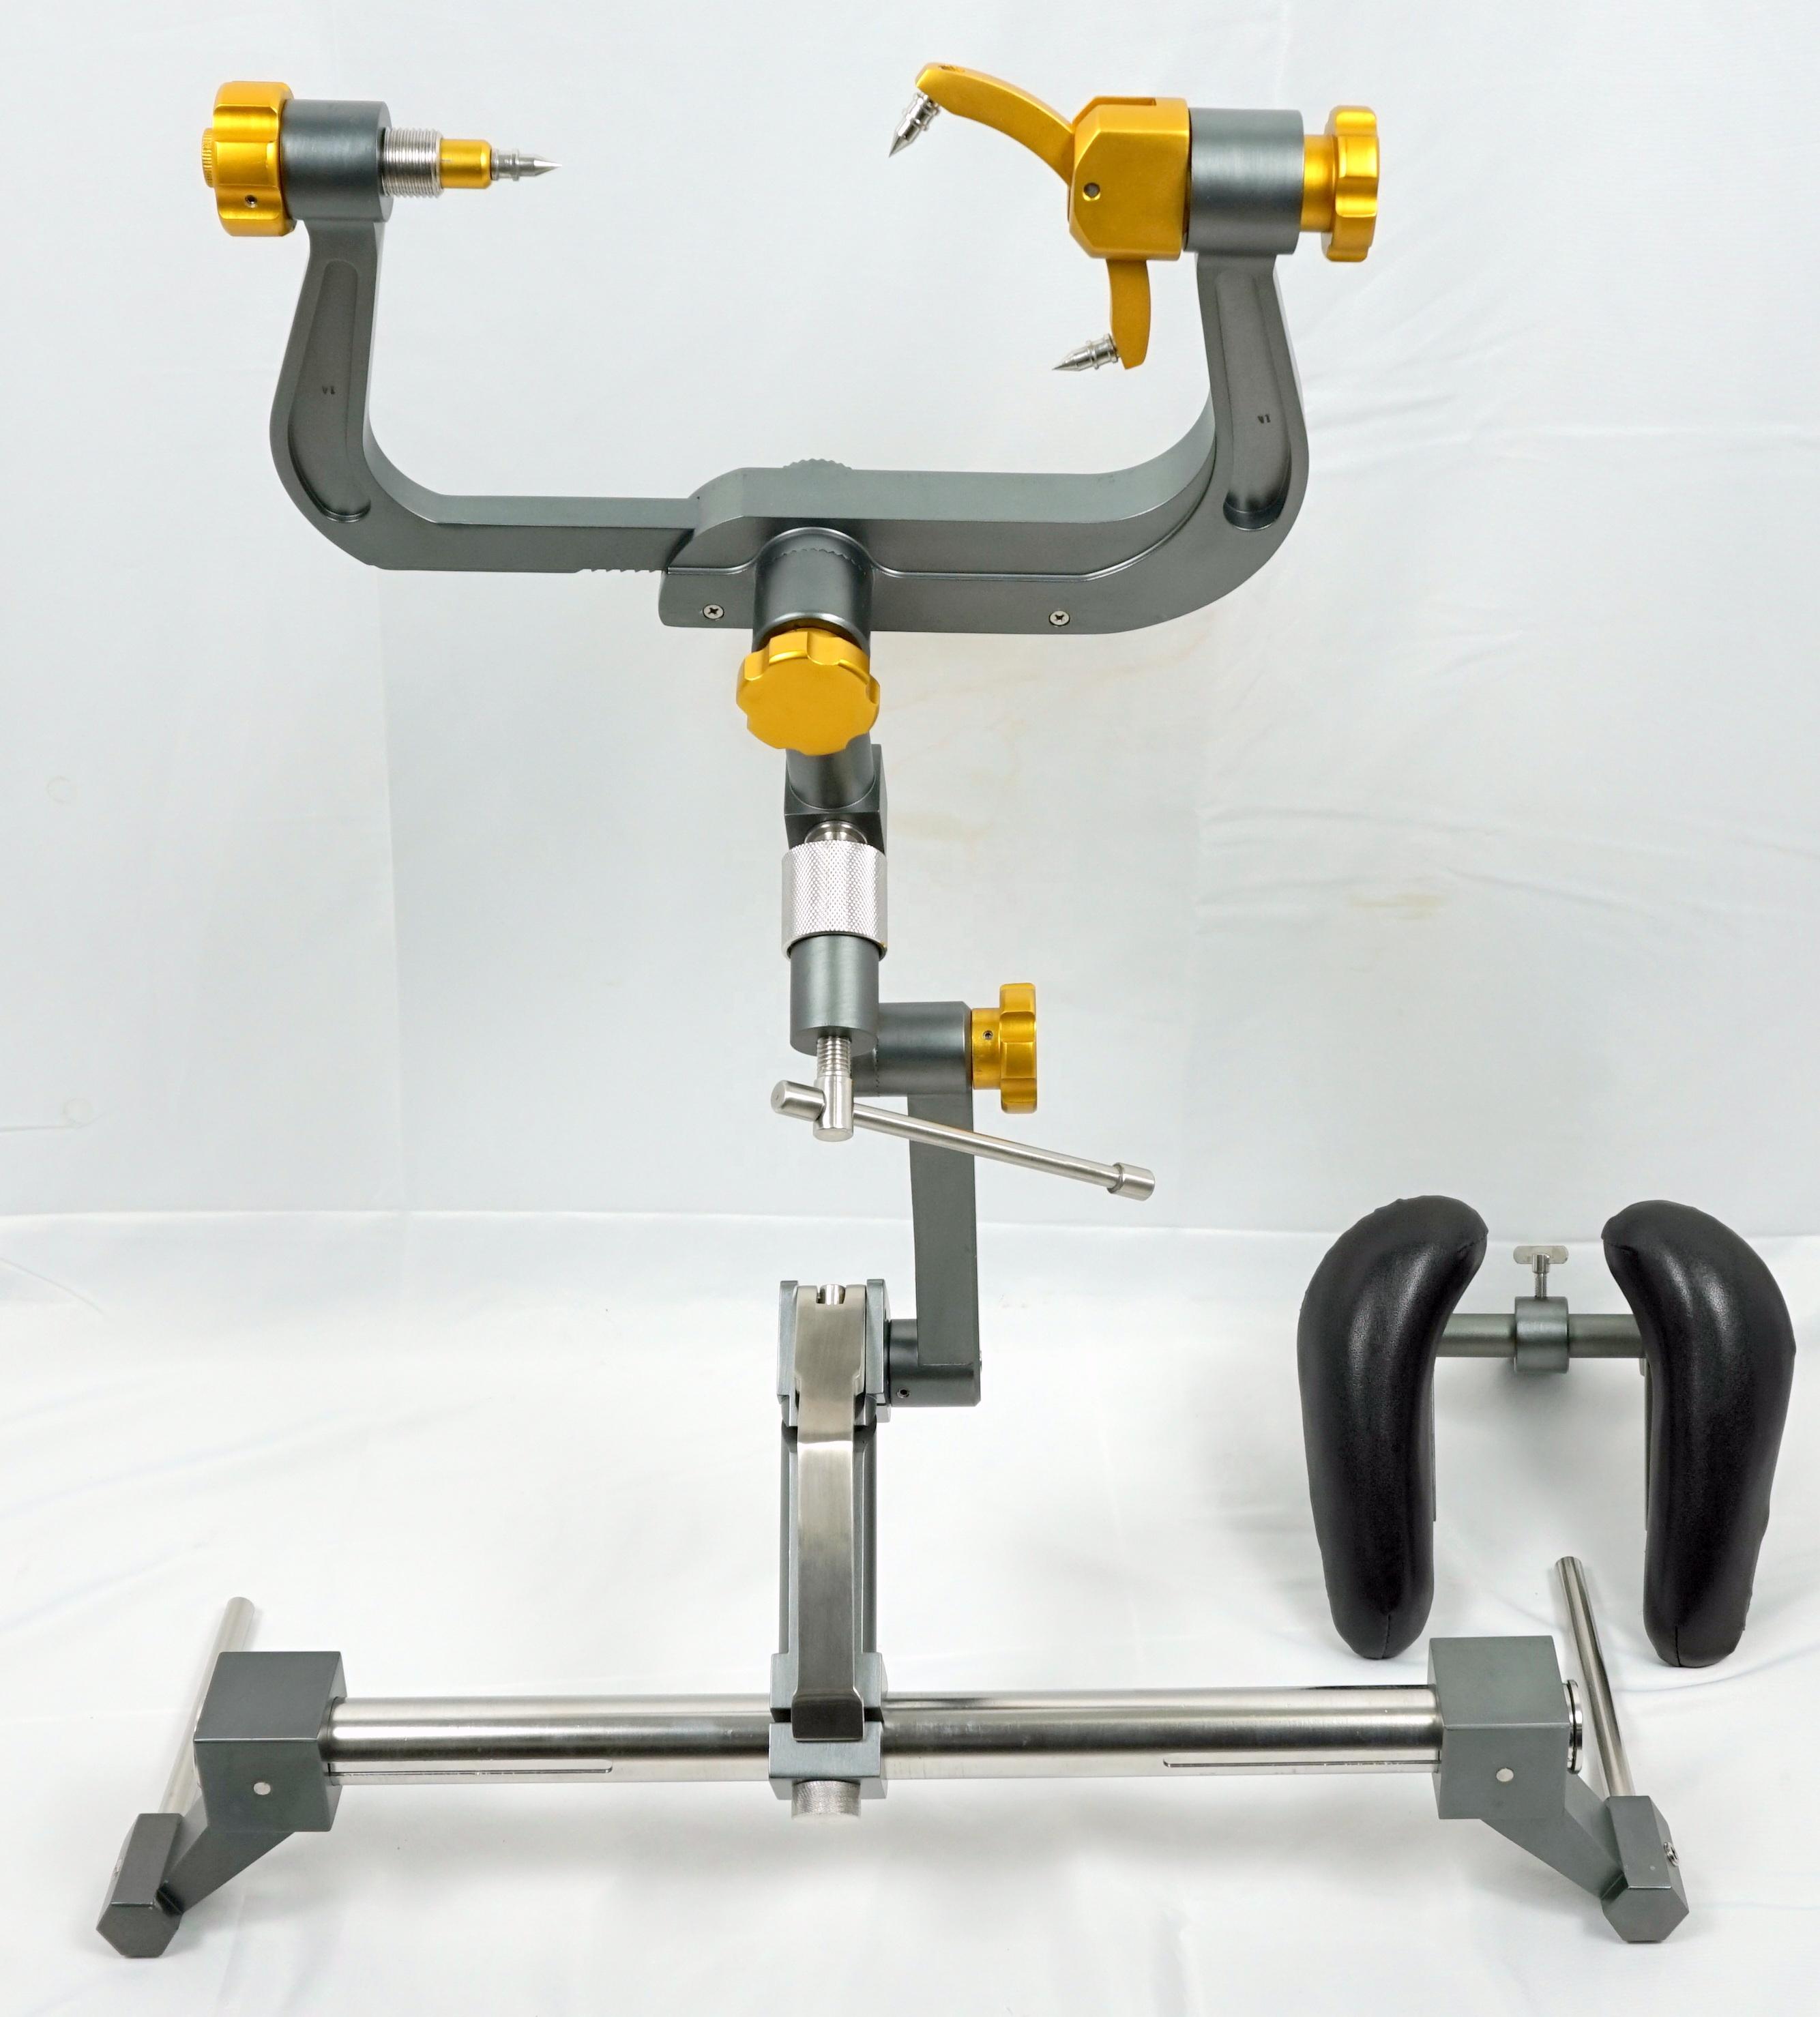 Aluminum Alloy Mayfield Skull Clamp/Neurosurgery Operating Table Head Clamp Mayfield Skull Holder HXY-TJ-005